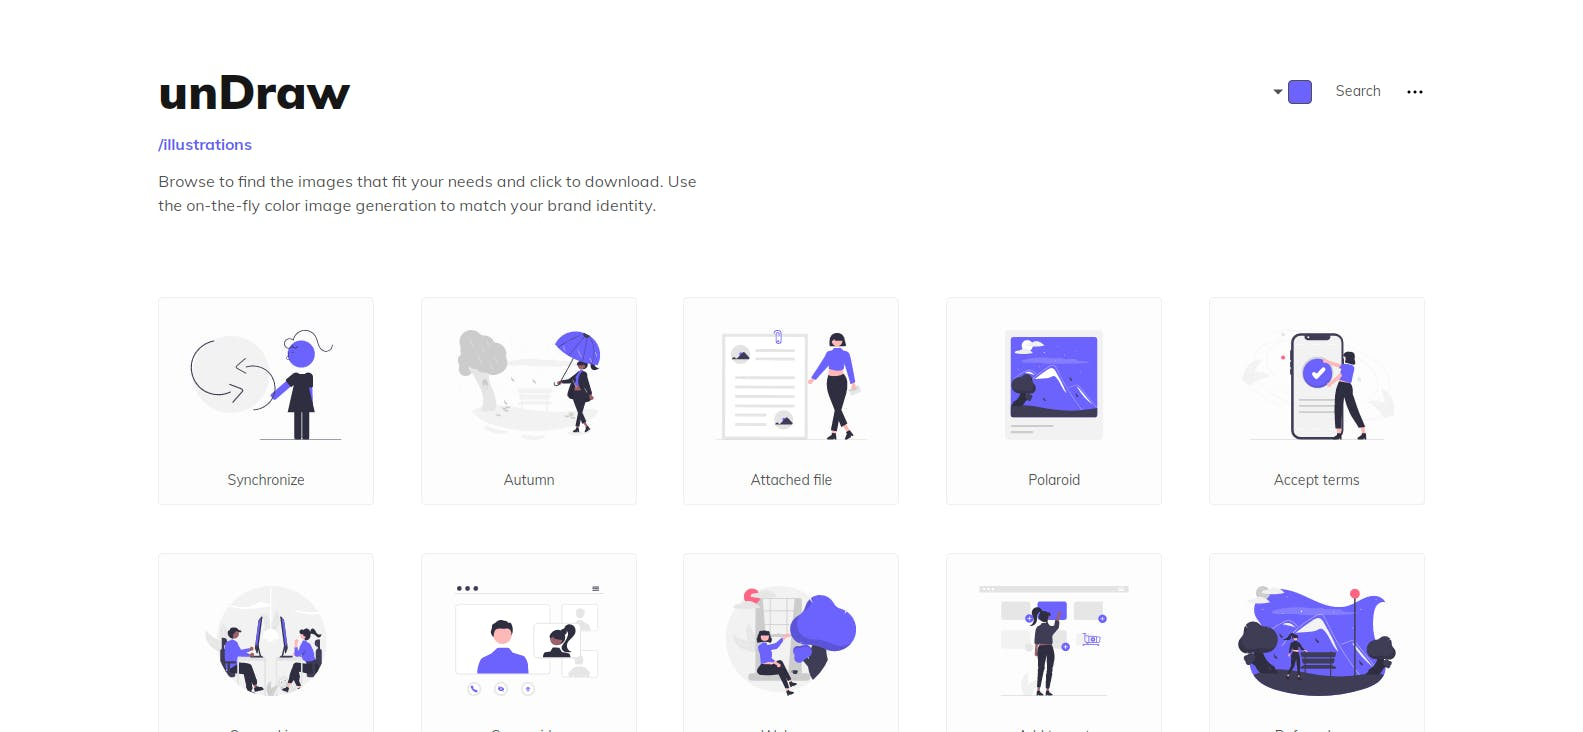 undraw homepage